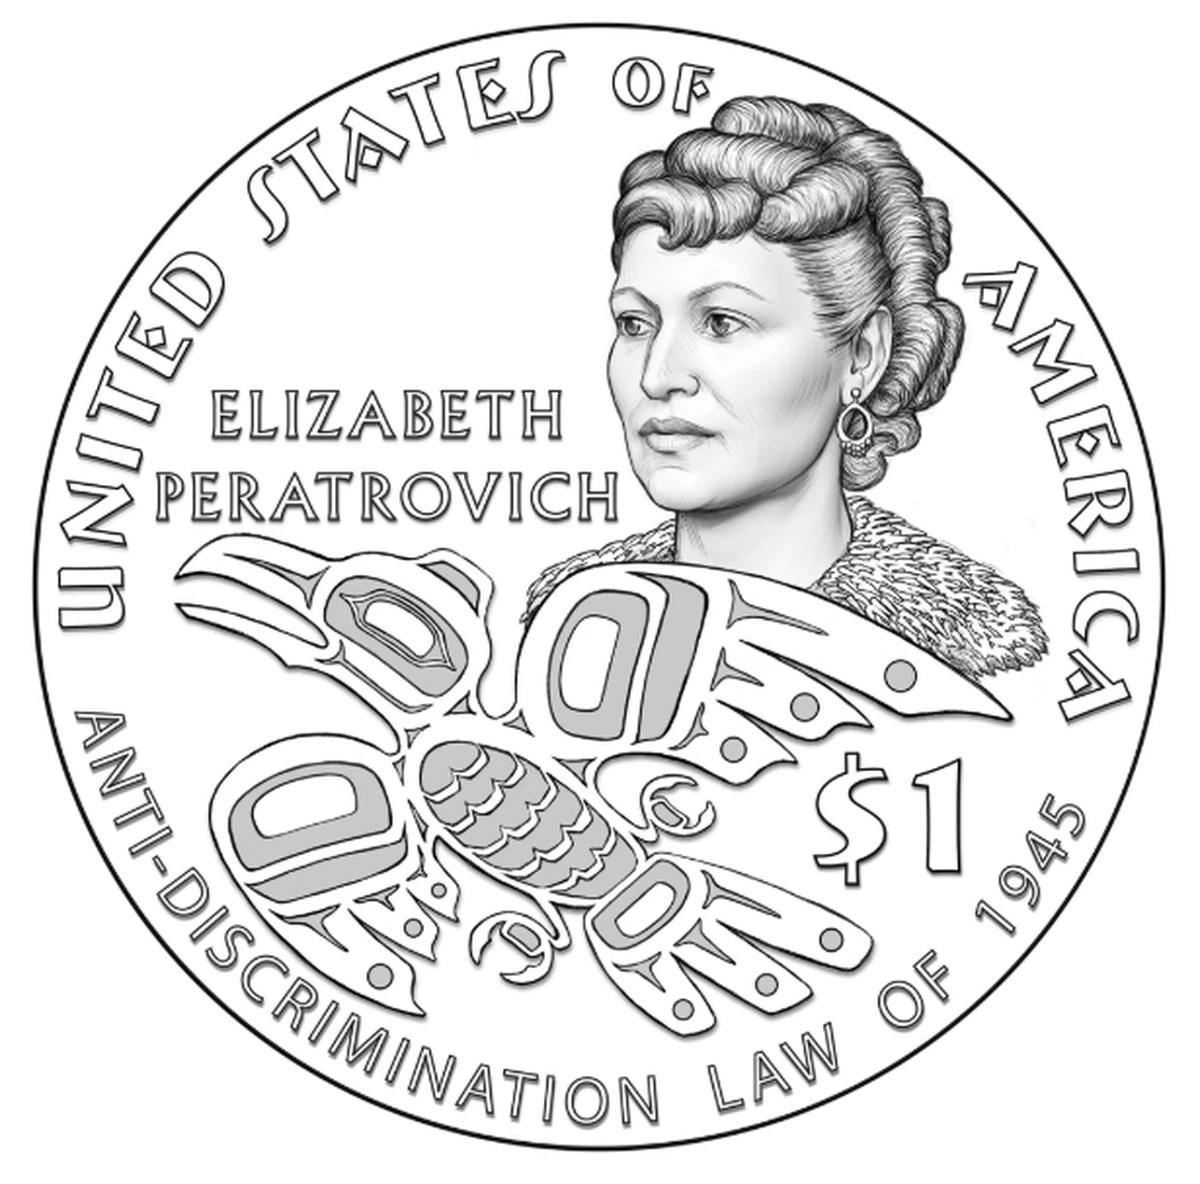 Alaska Native leader Elizabeth Peratrovich commemorated on